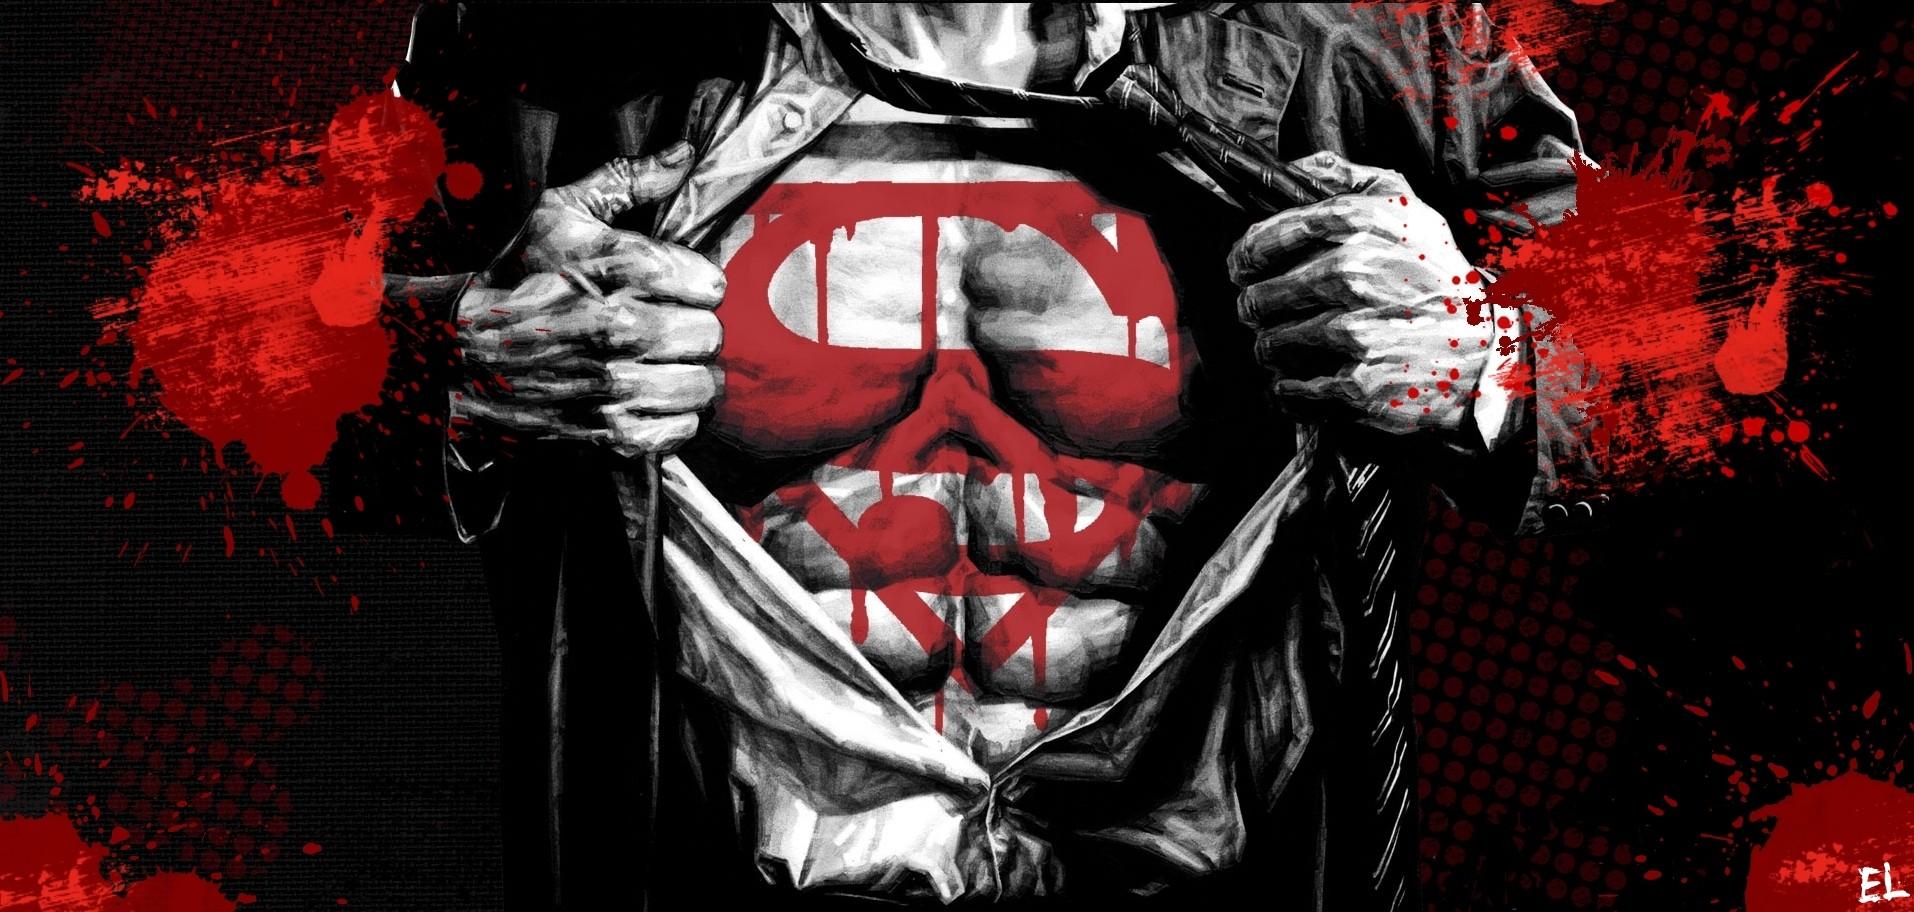 evil superman wallpaper hd - photo #45